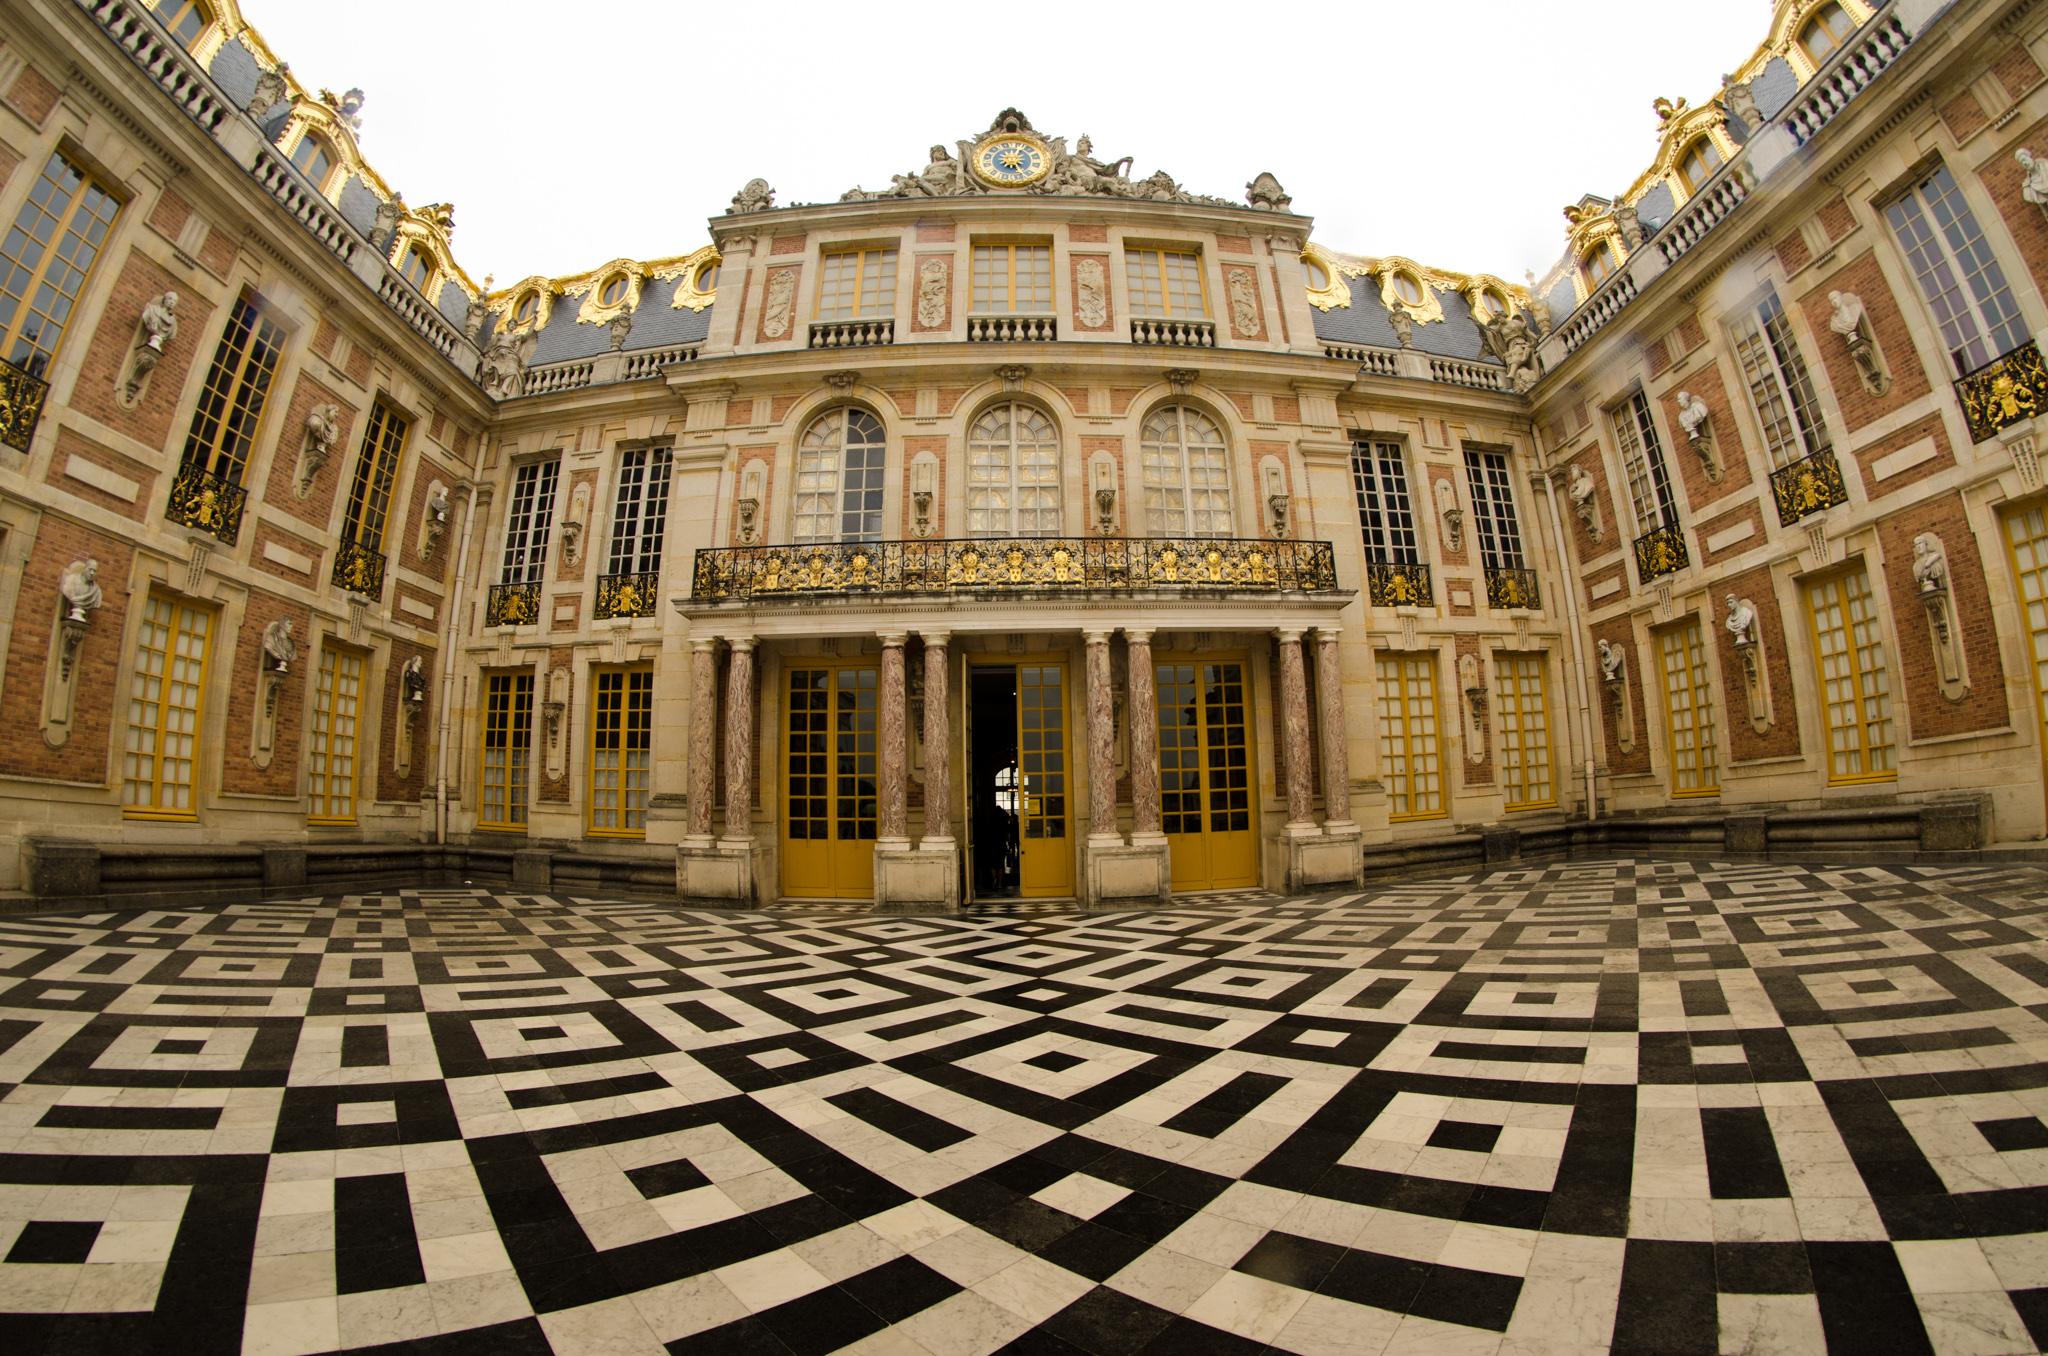 2015-07-28 - Jamritha Honeymoon - Palace of Versailles - 085